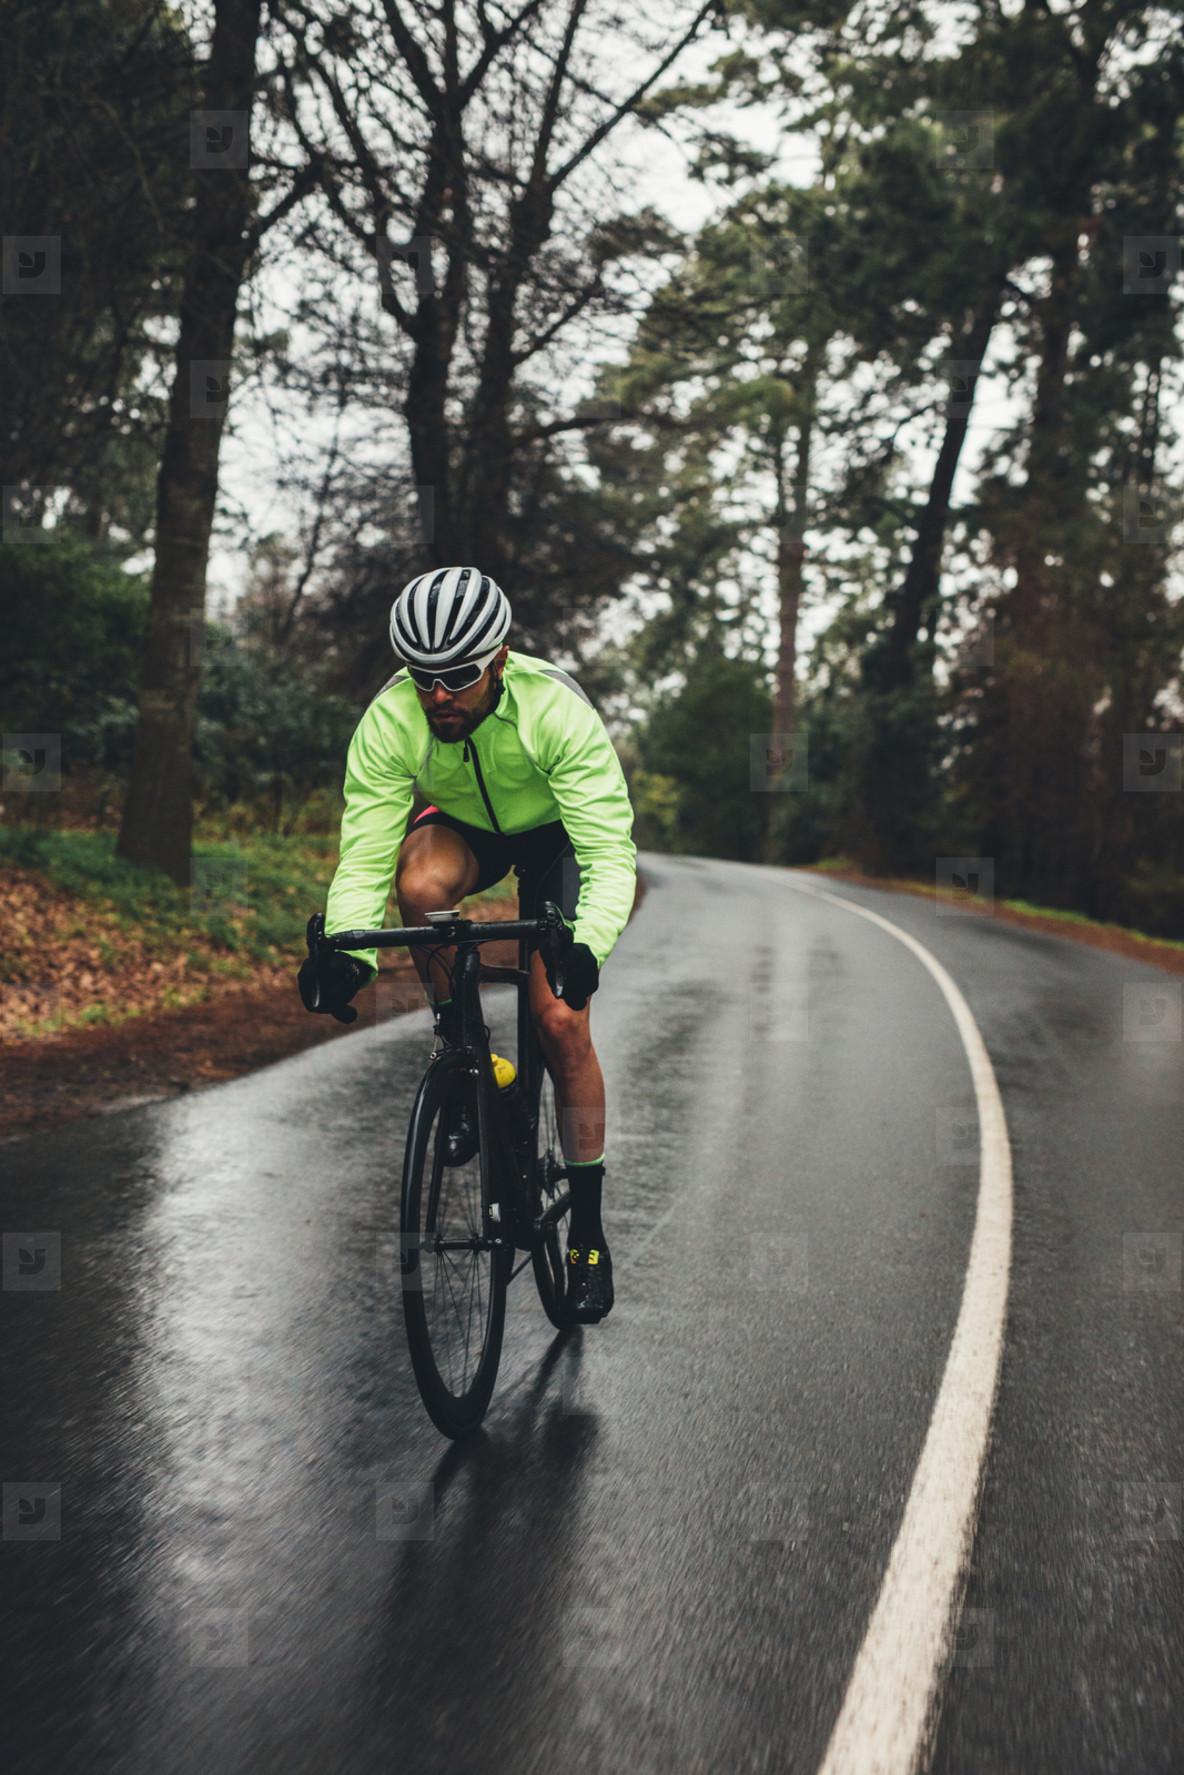 Cyclist training on a rainy day